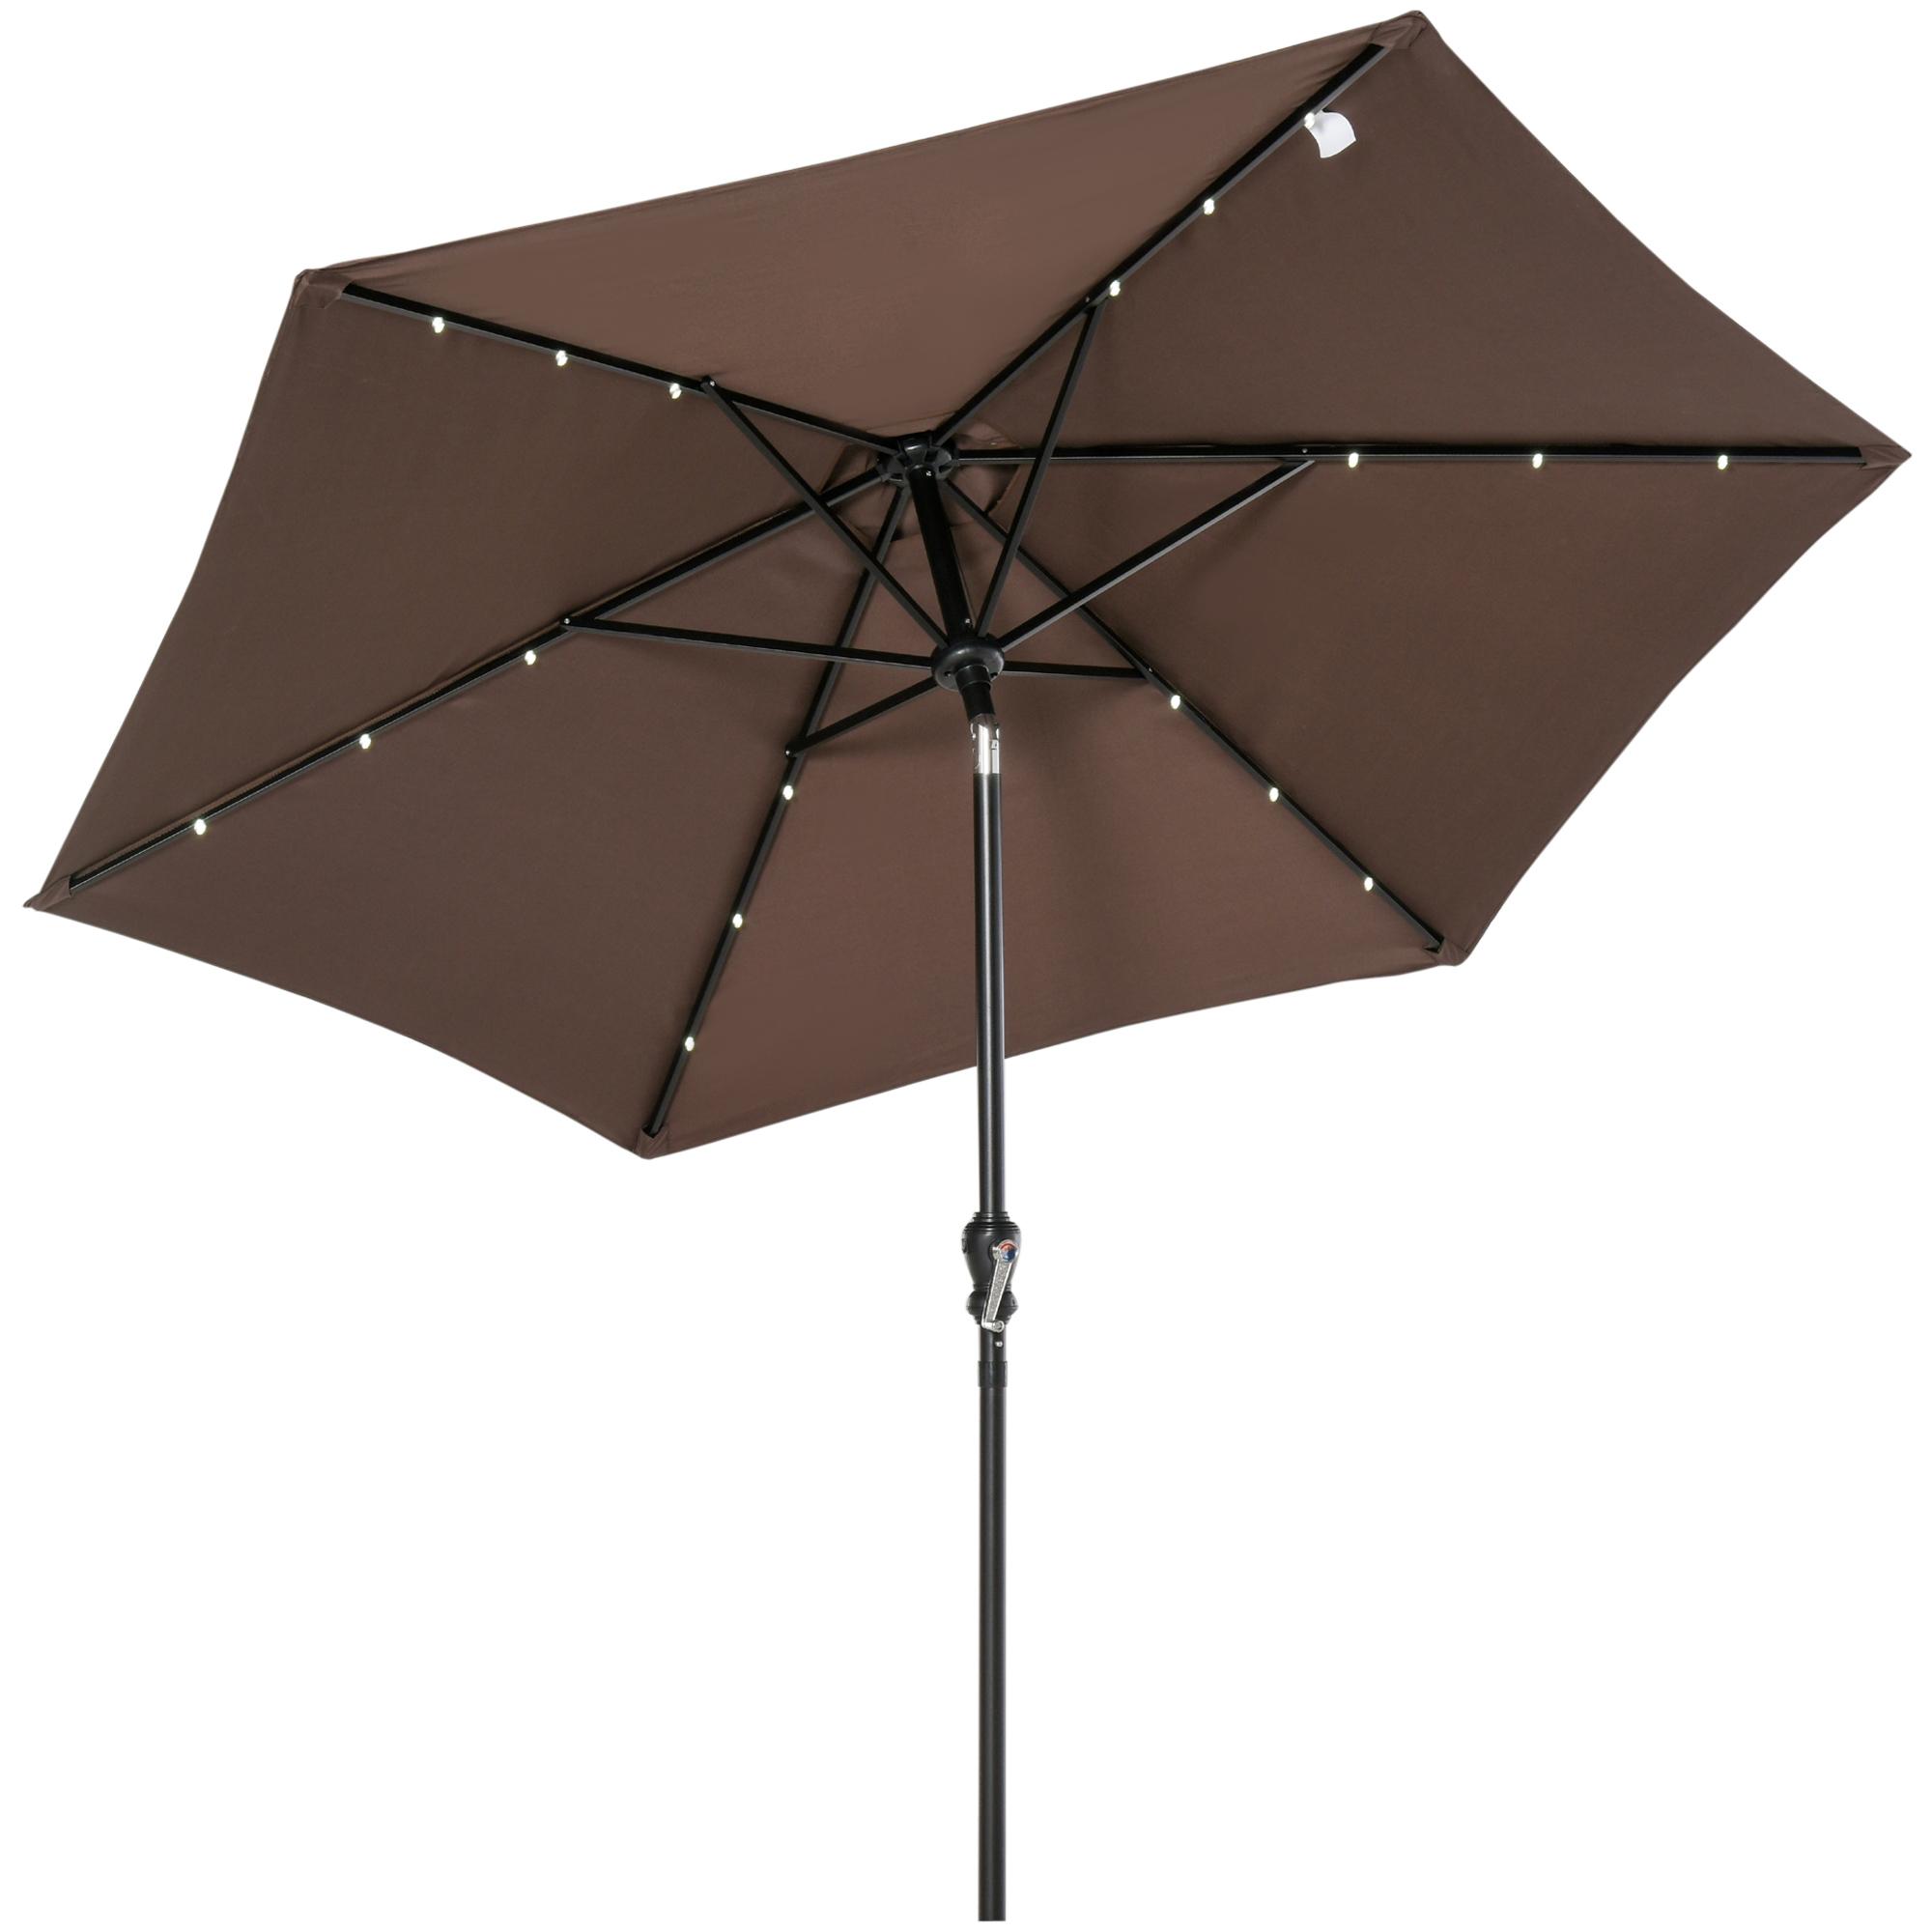 Parasol lumineux hexagonal inclinable parasol LED chocolat